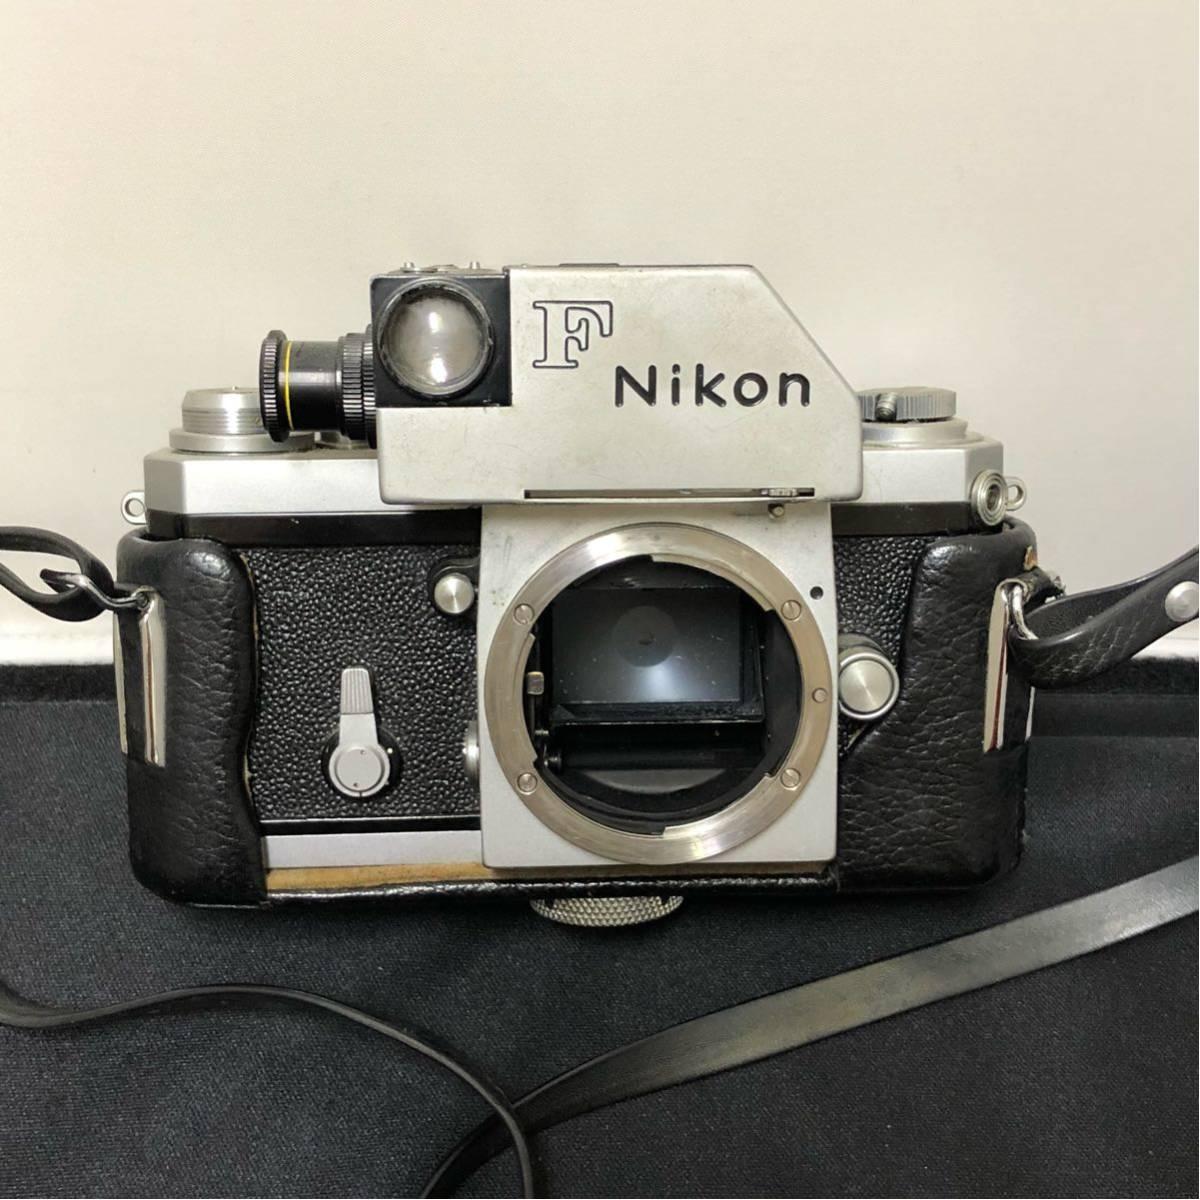 ♯ NIKON ニコン 一眼レフ カメラ F nikkor-ud 1:3.5 20mm nikkor 50mm 1:1.2 レンズ2本セット_画像4